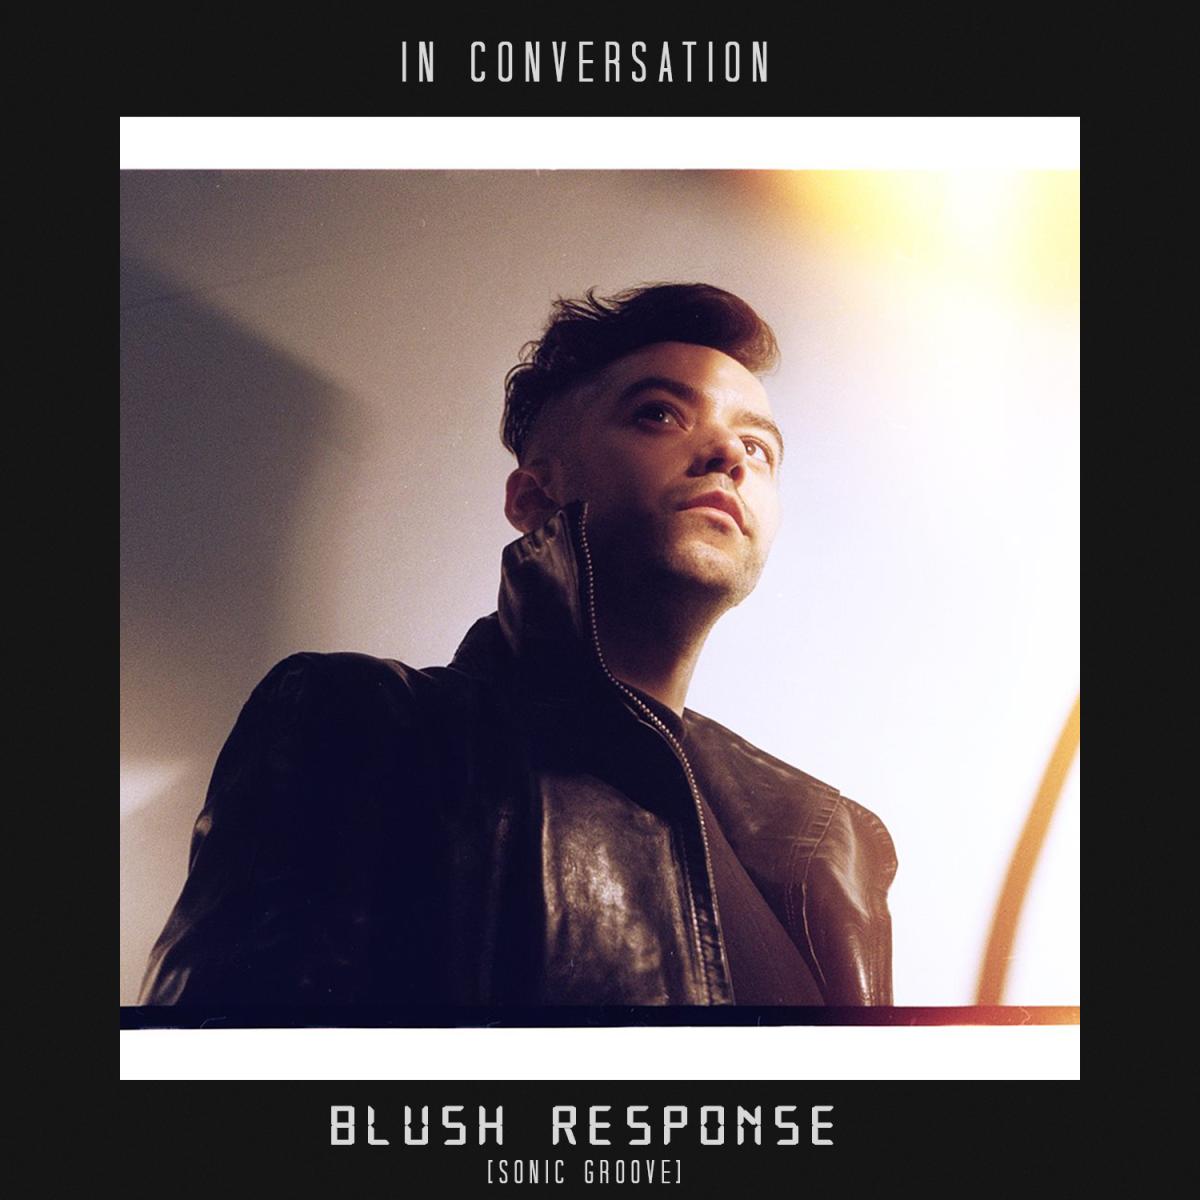 in-conversation-blush-response